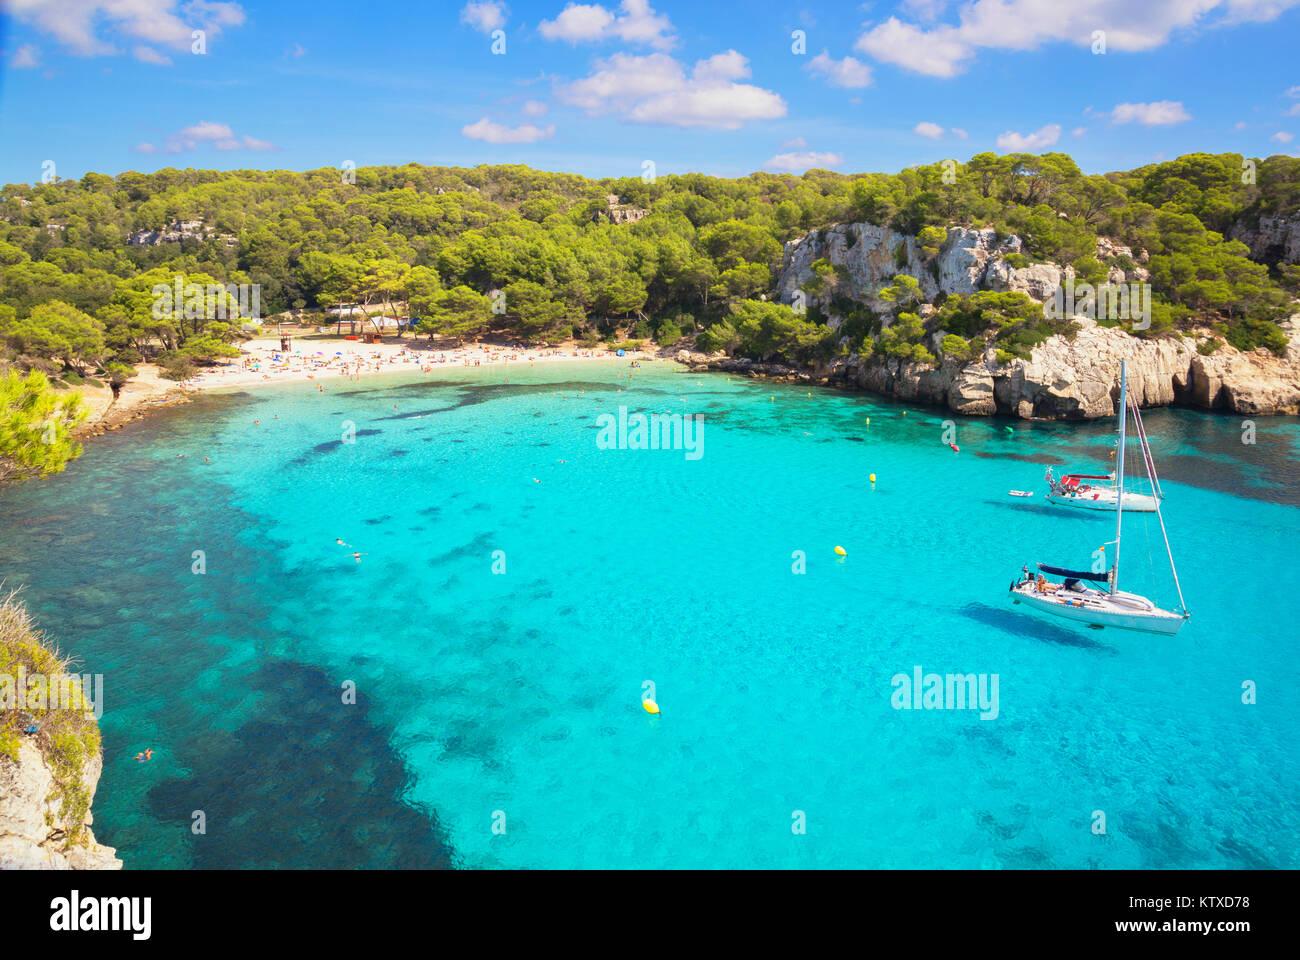 View of Cala Macarella and sailboats, Menorca, Balearic Islands, Spain, Mediterranean, Europe - Stock Image